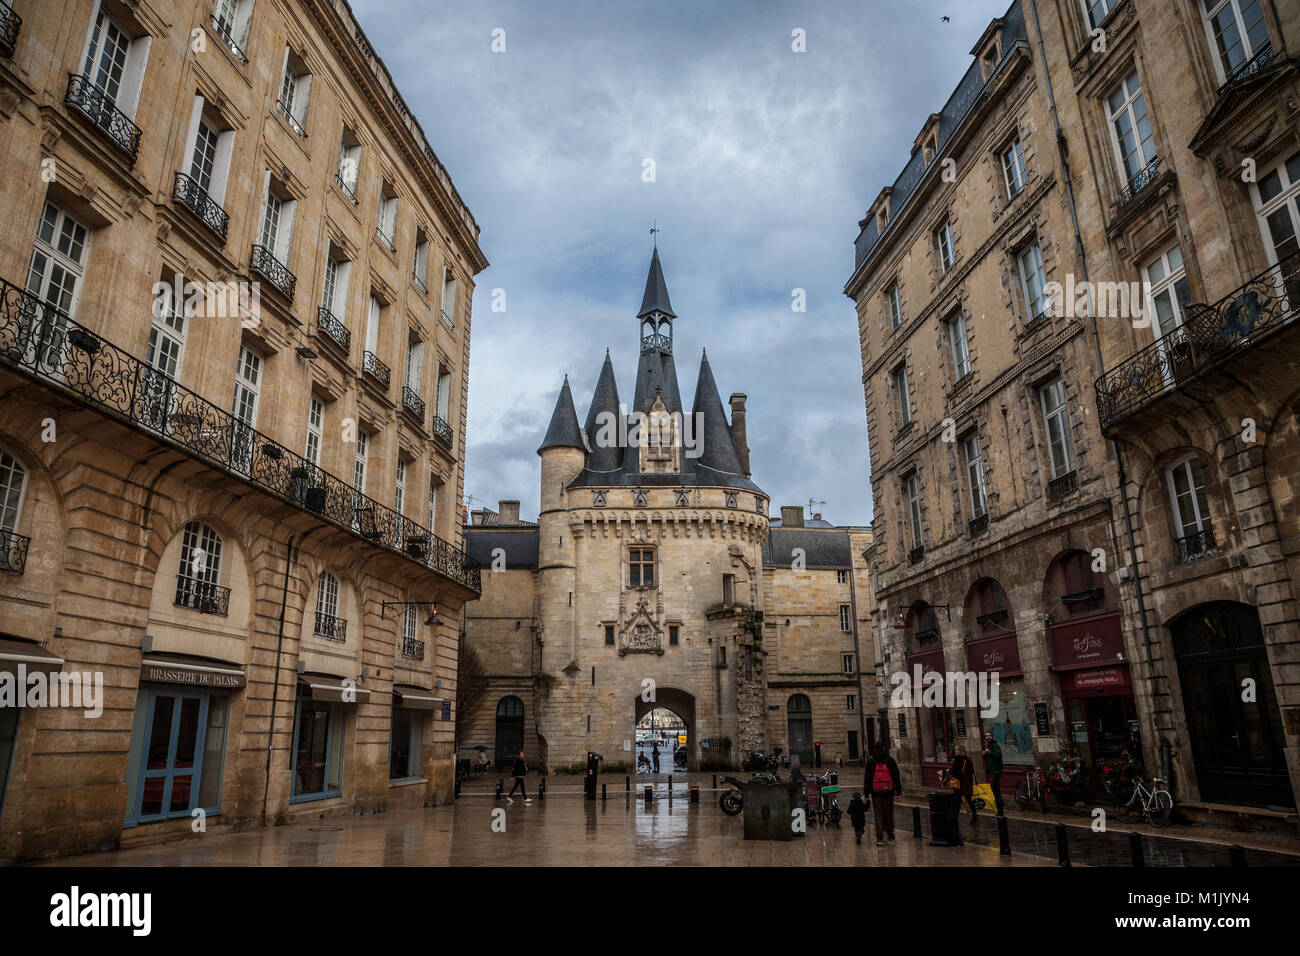 BORDEAUX, FRANCE - DECEMBER 26, 2017: Porte Cailhau (Cailhau Gate) in the city center of Bordeaux. This medieval - Stock Image